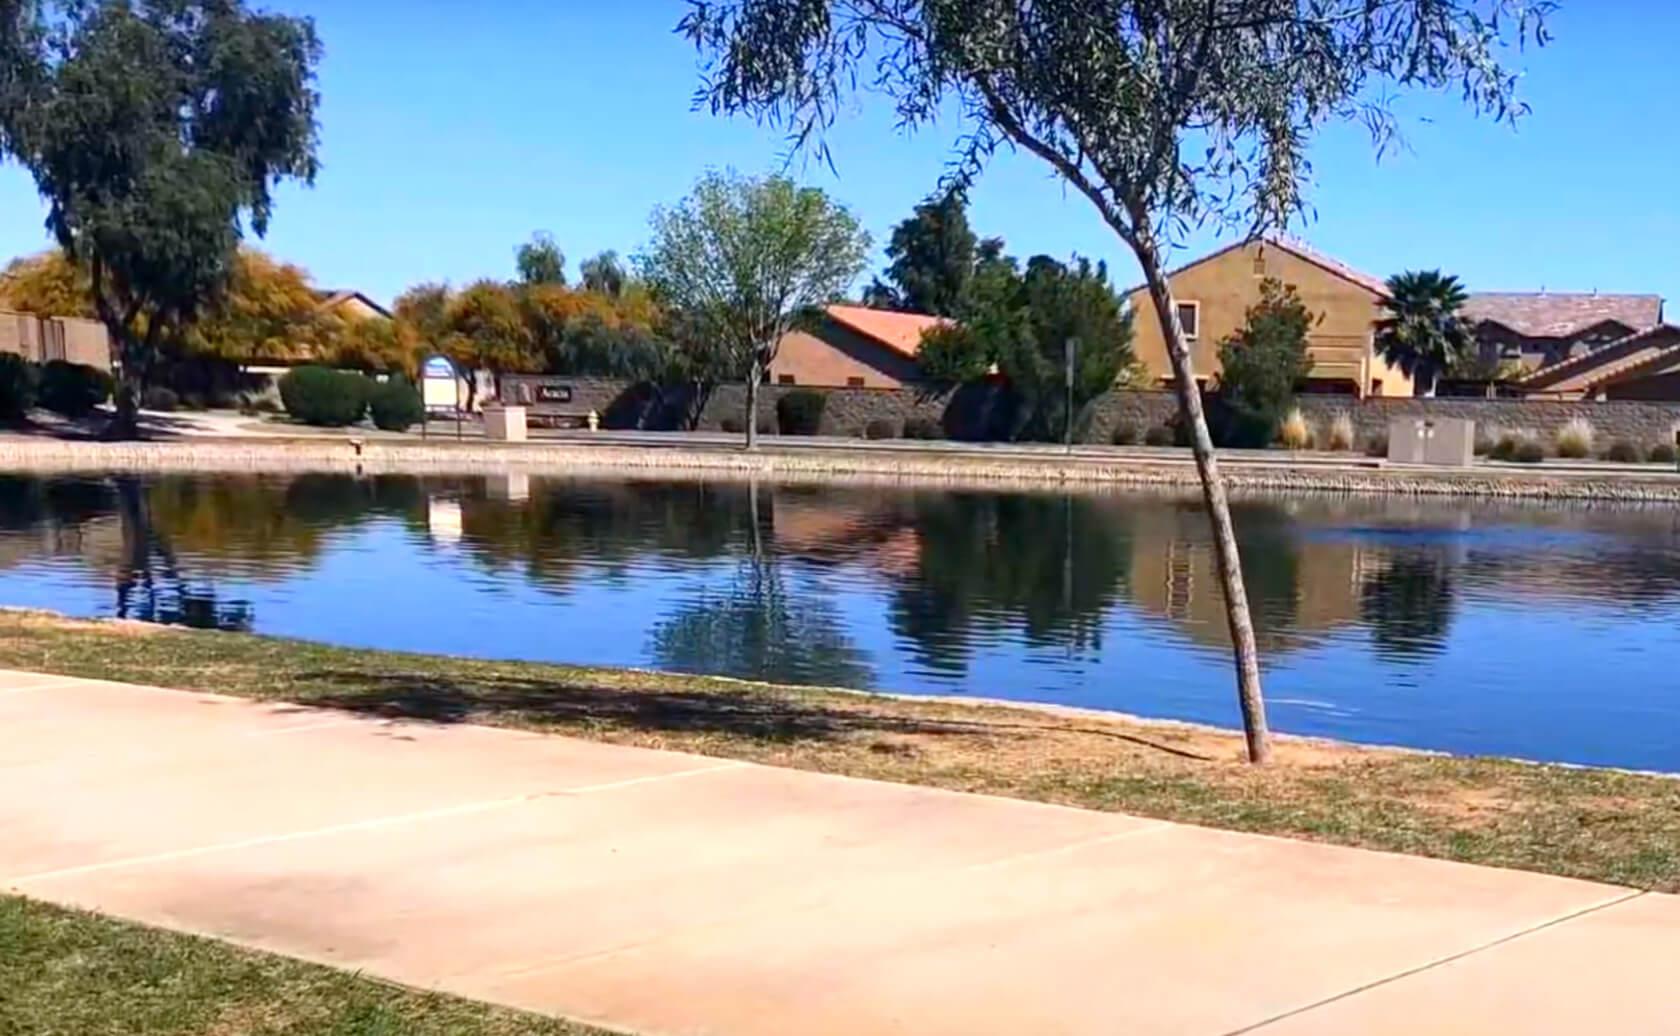 Pacana-Park-Lake-Fishing-Guide-Report-Maricopa-AZ-01